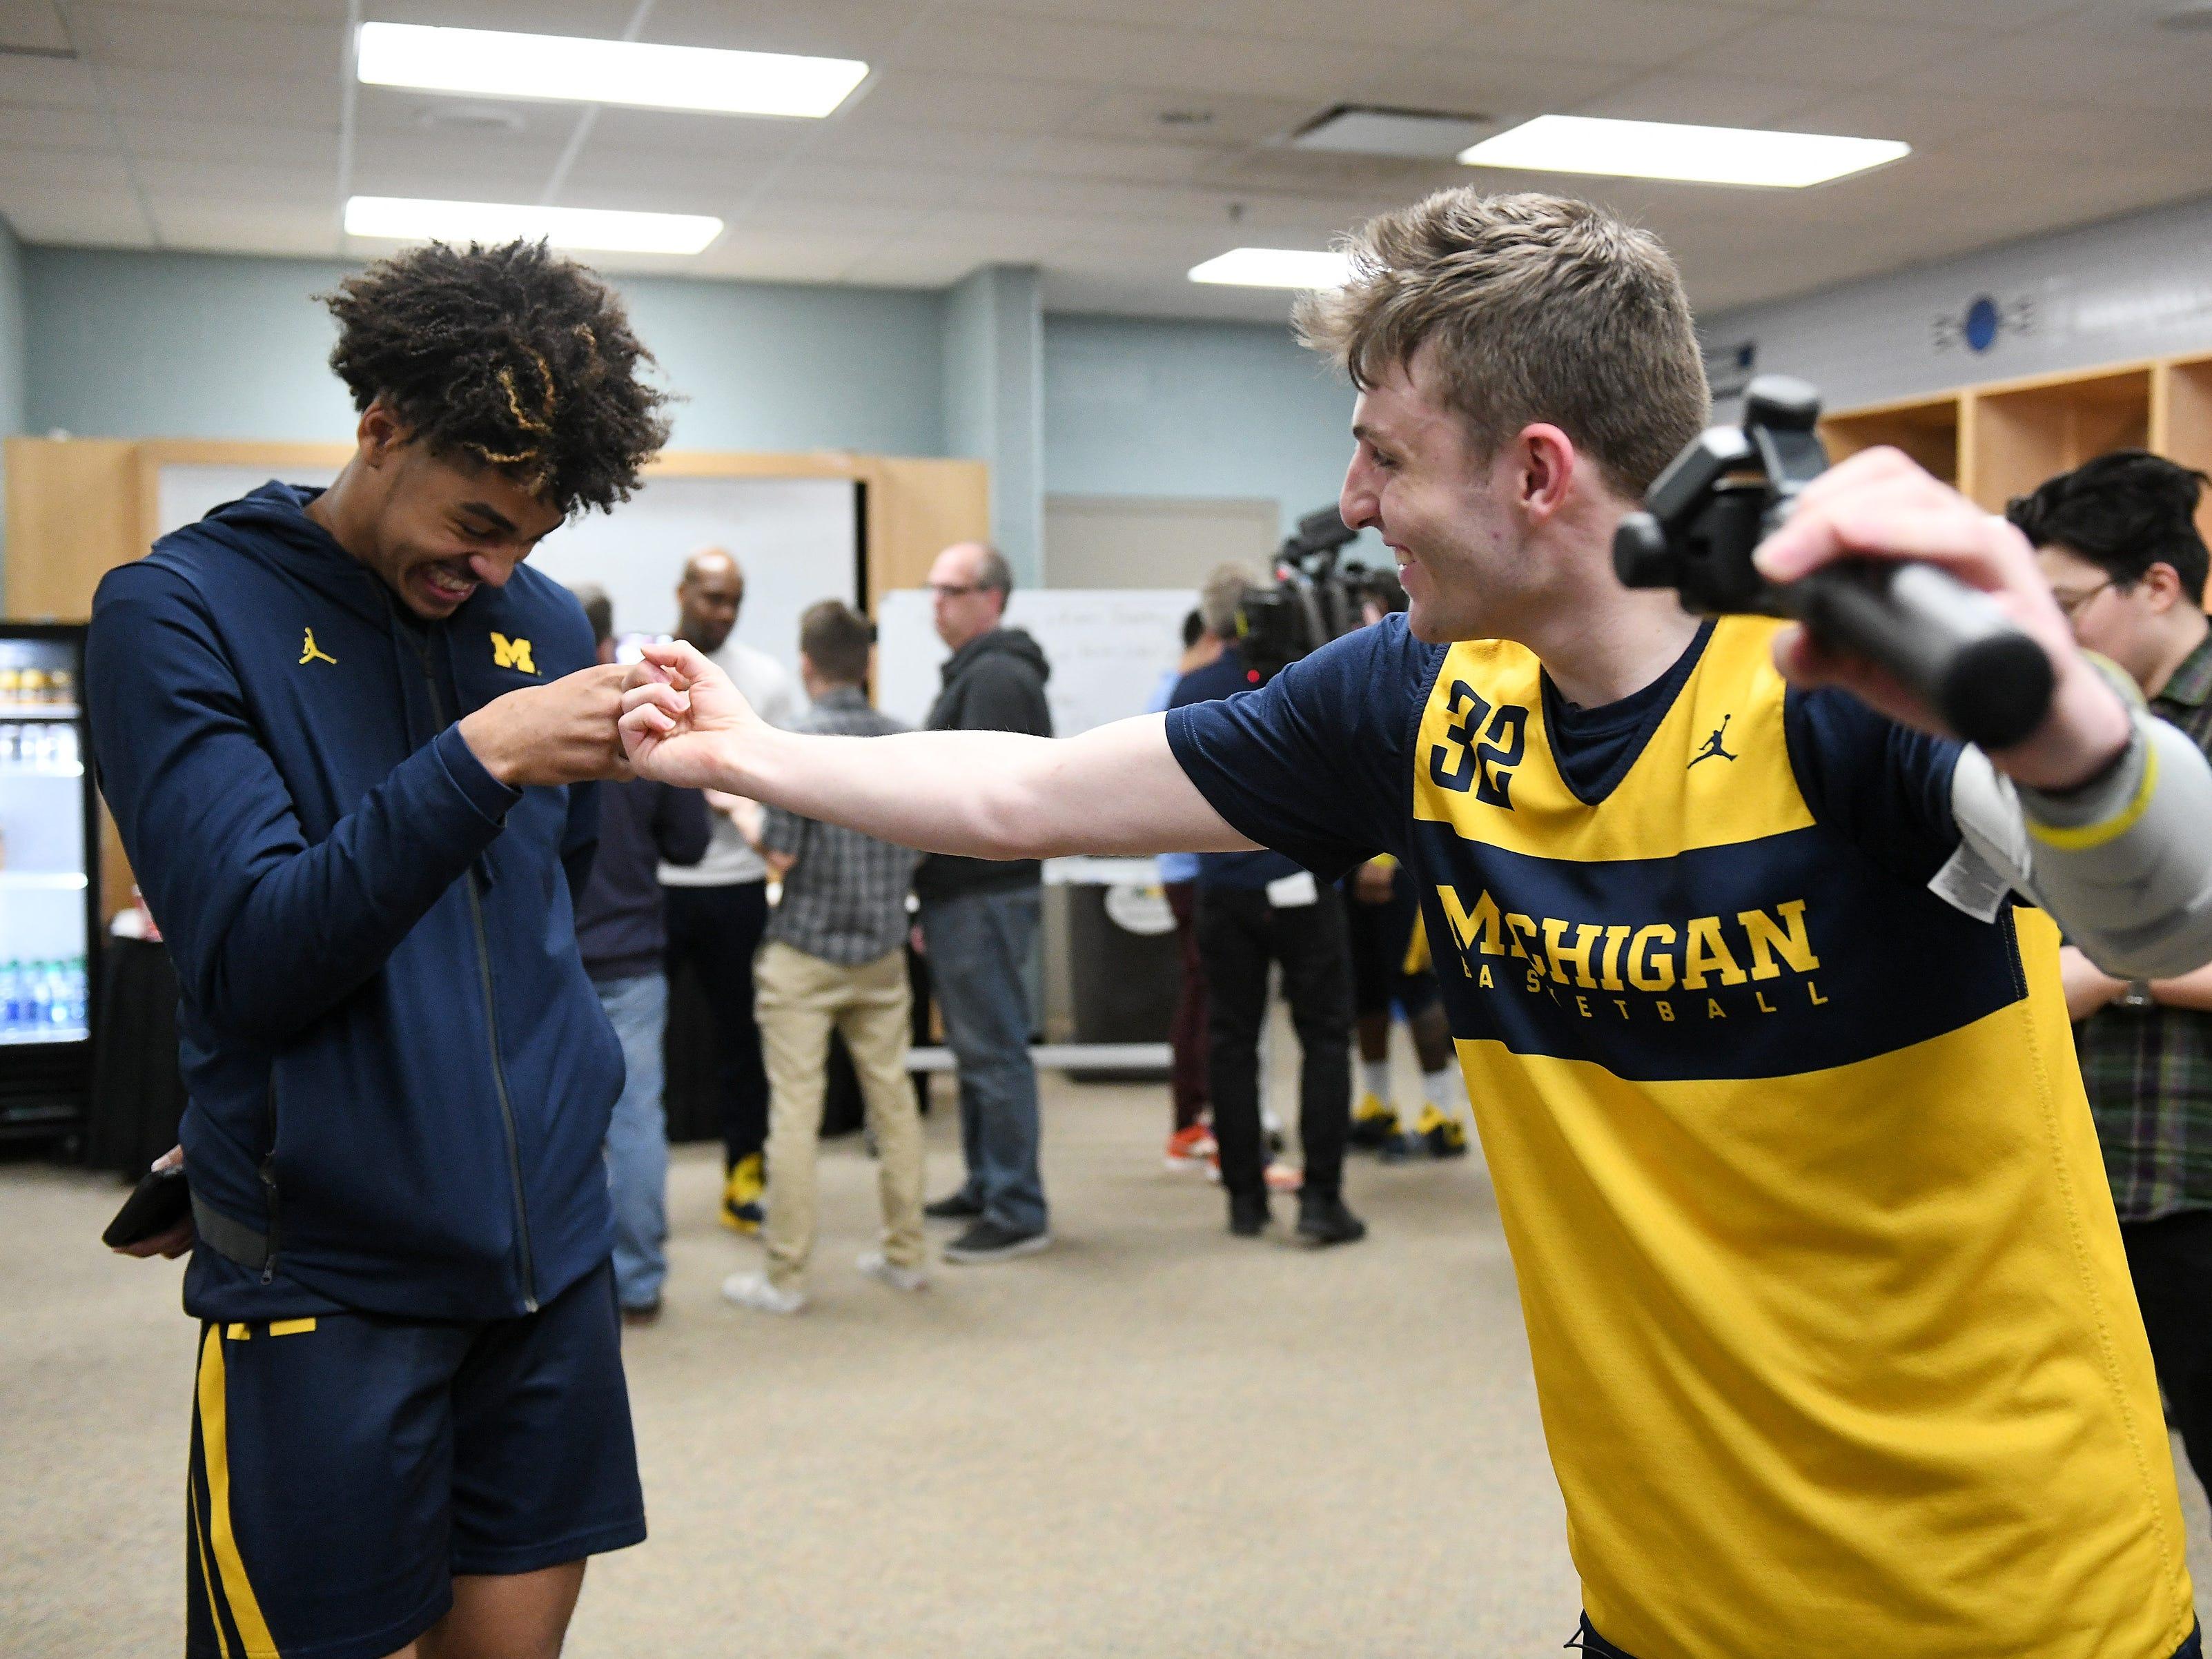 Michigan guard Luke Wilson jokes with guard Jordan Poole while Wilson is shooting video.